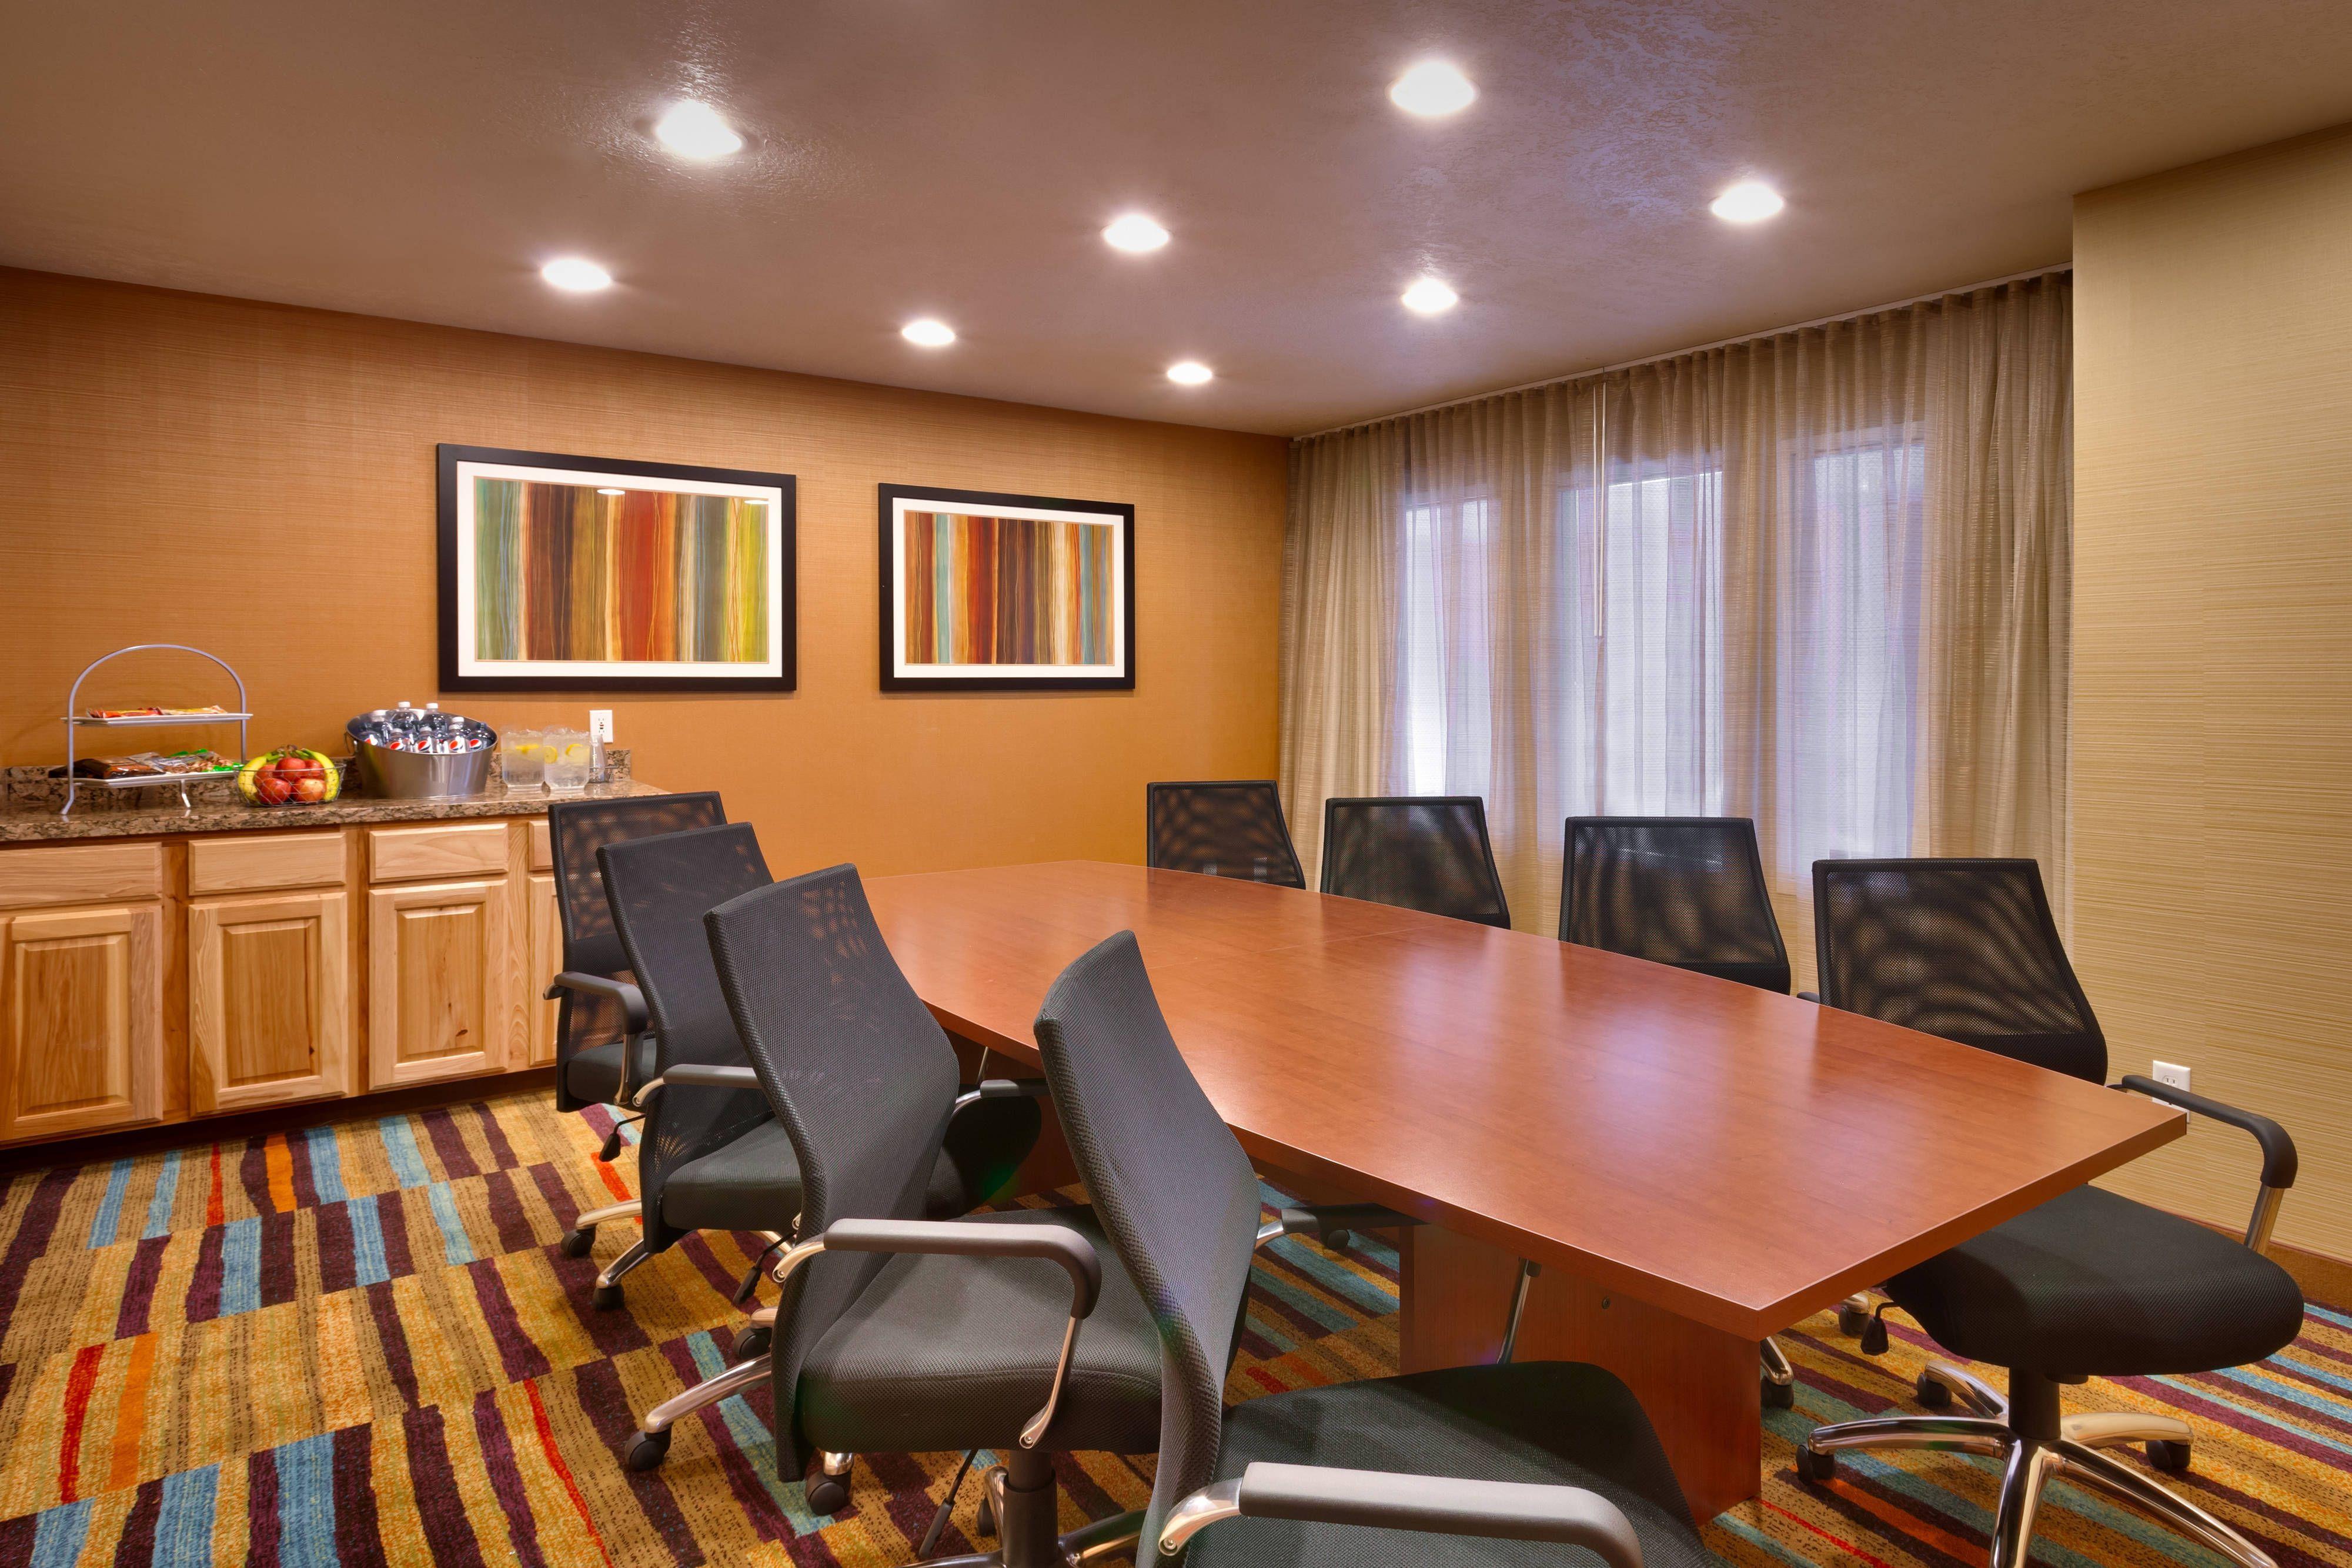 Fairfield inn salt lake city draper meeting room rooms enjoying